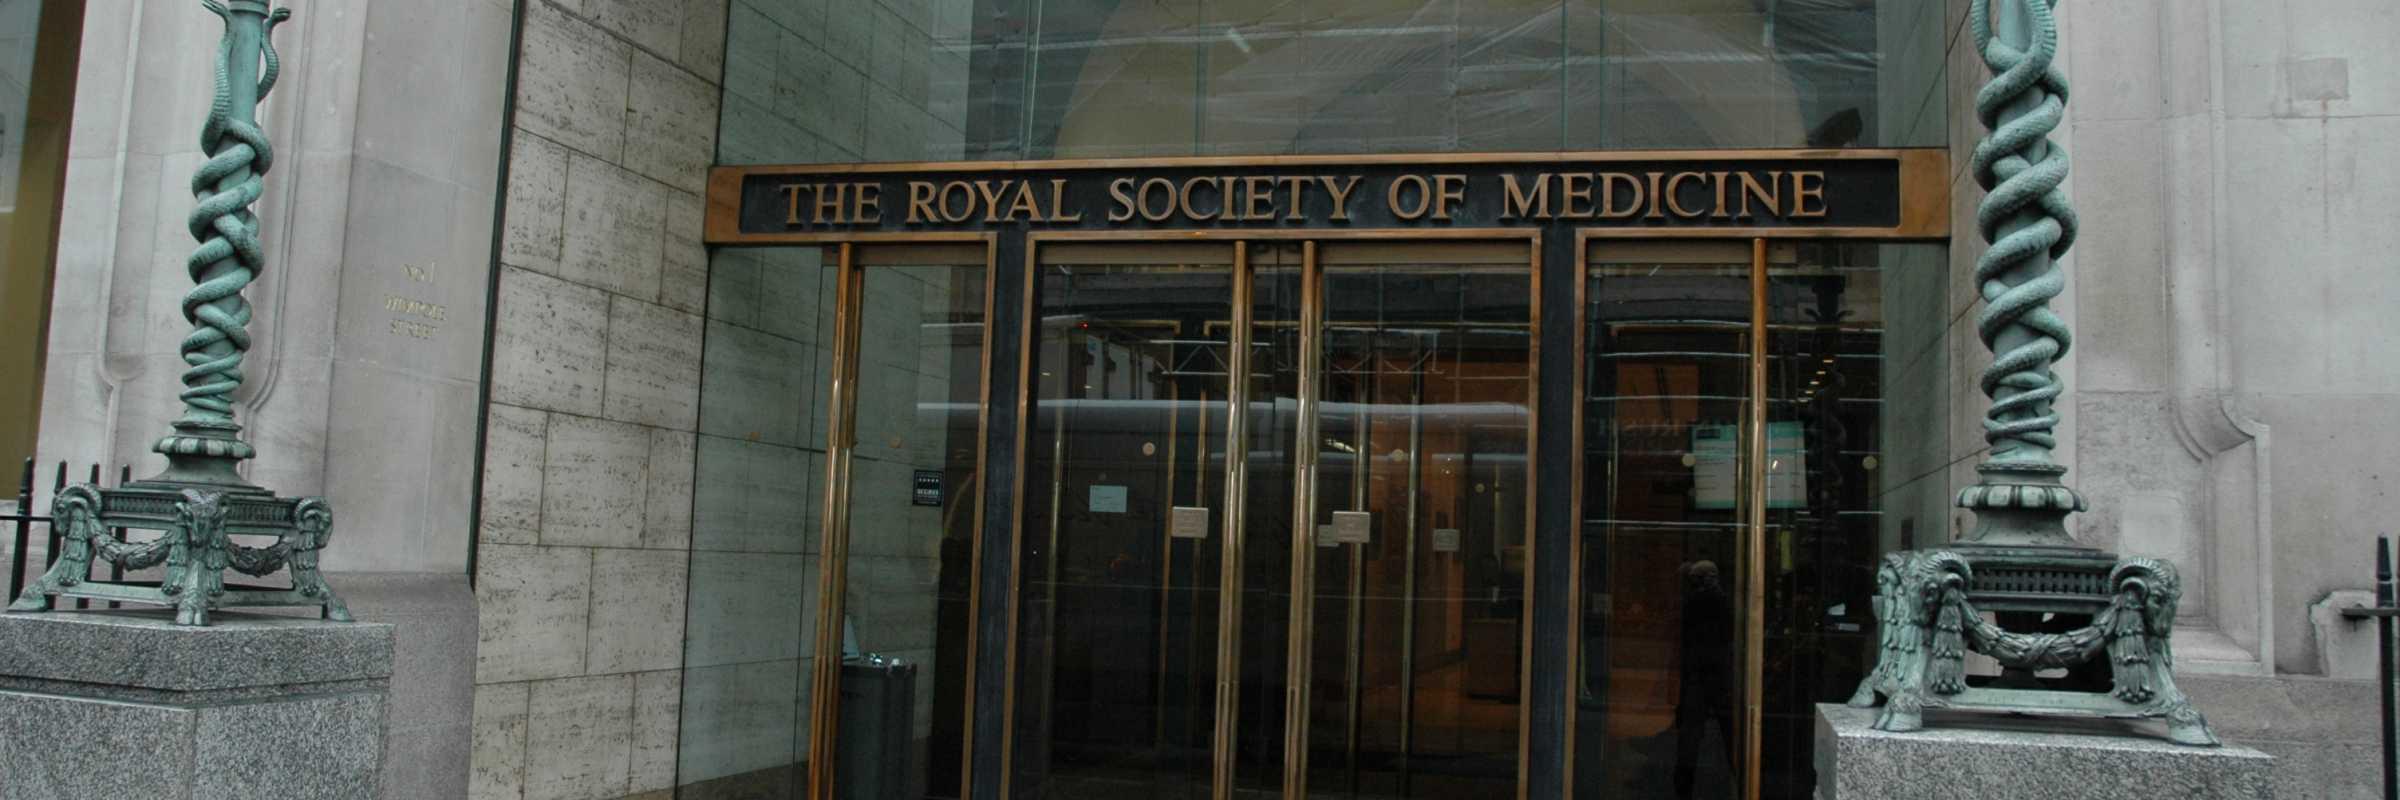 Royal Society of Medicine, 1 Wimpole Street venue